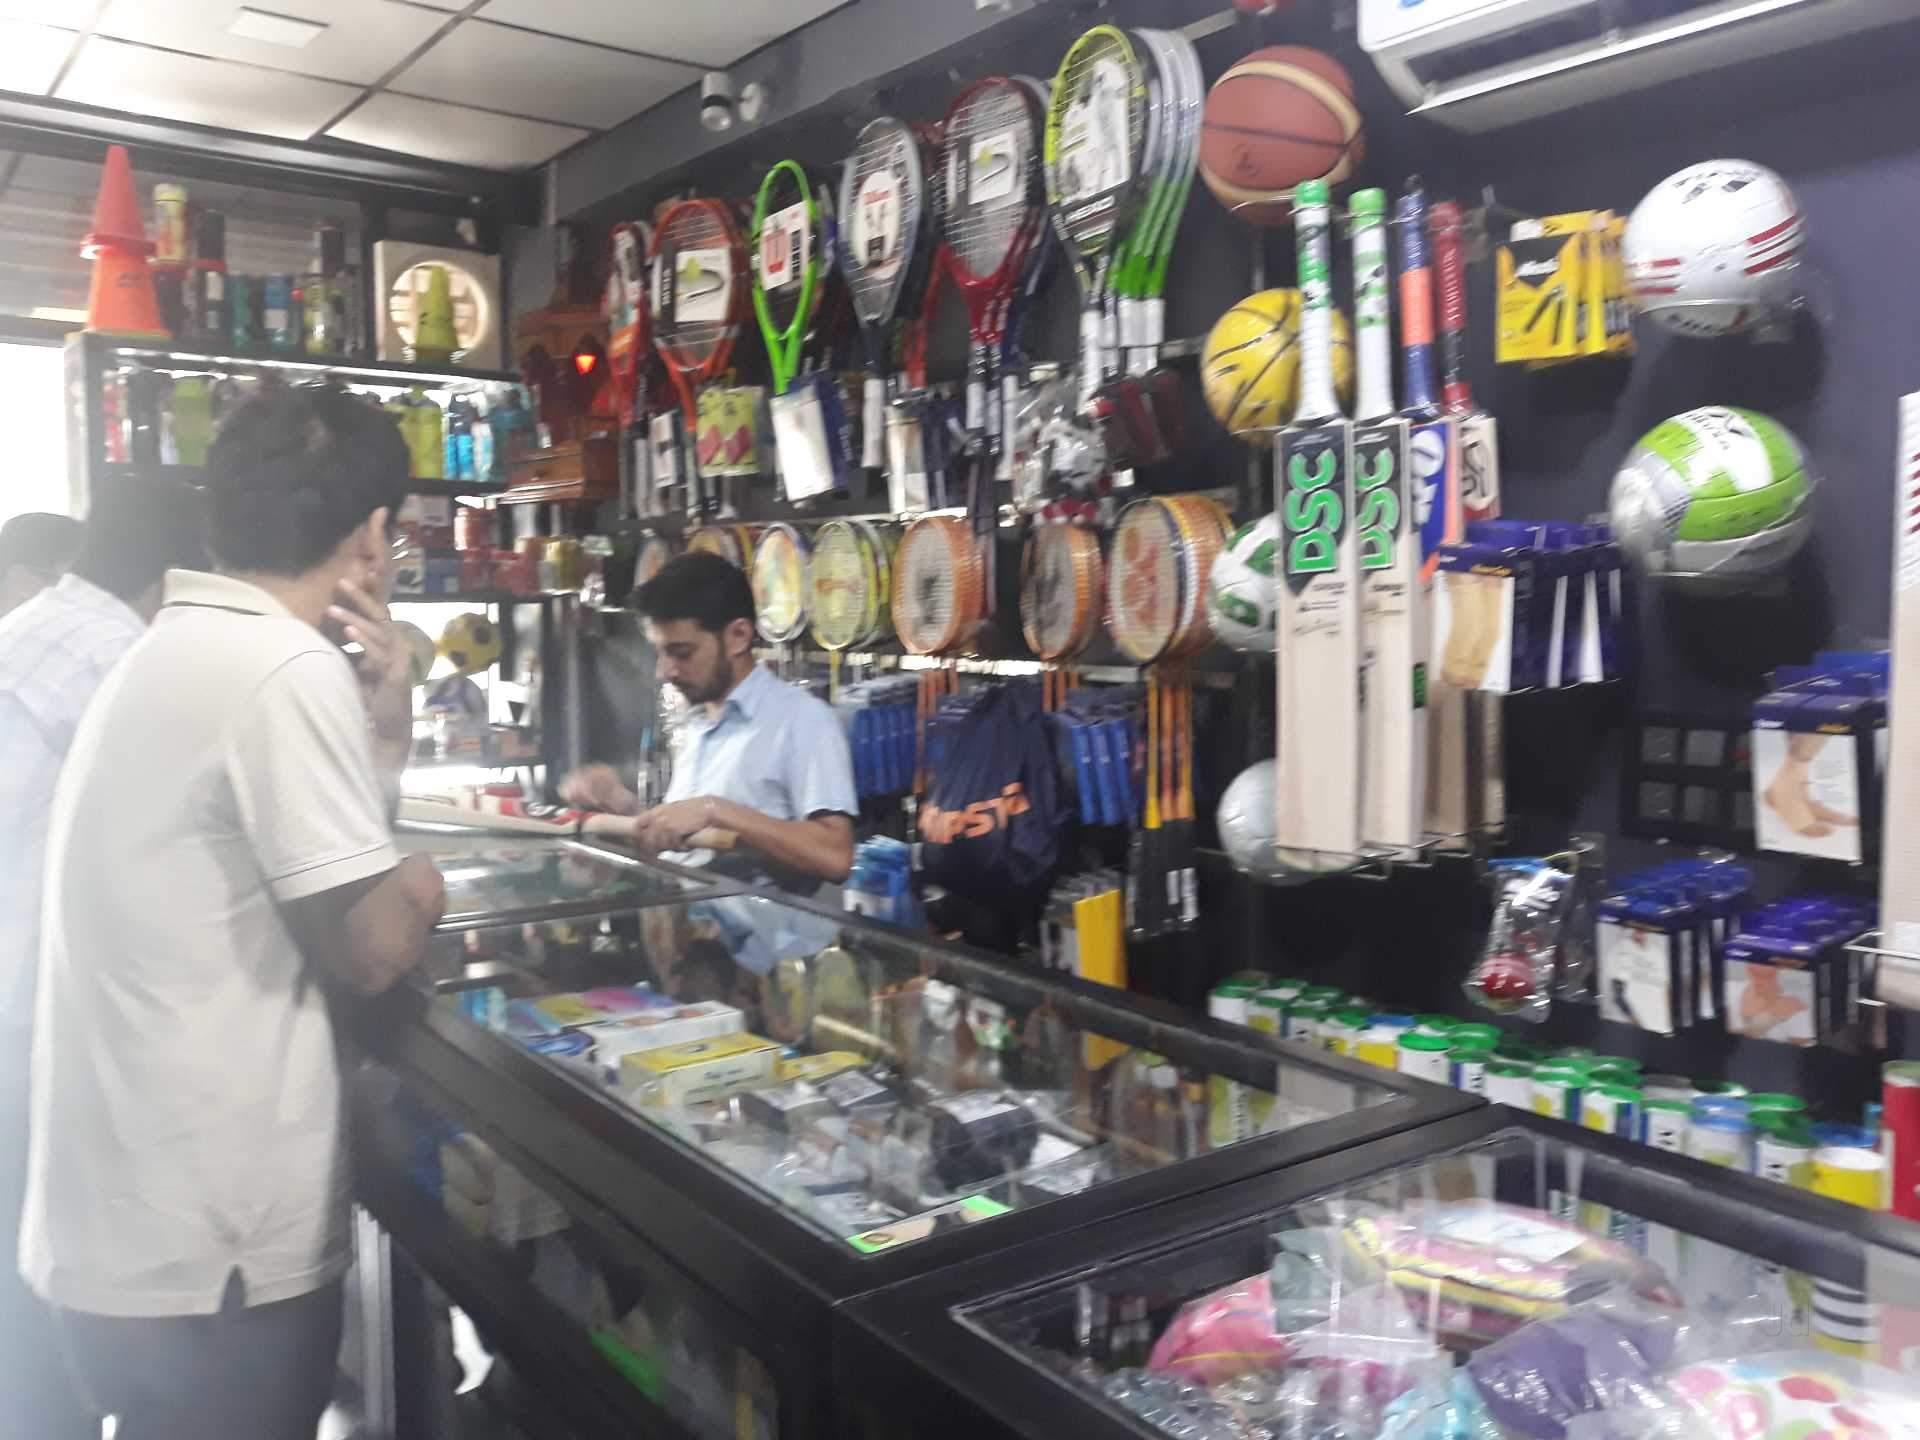 Sports Nation Photos Vaishali Nagar Jaipur  Pictures Images 1920x1440